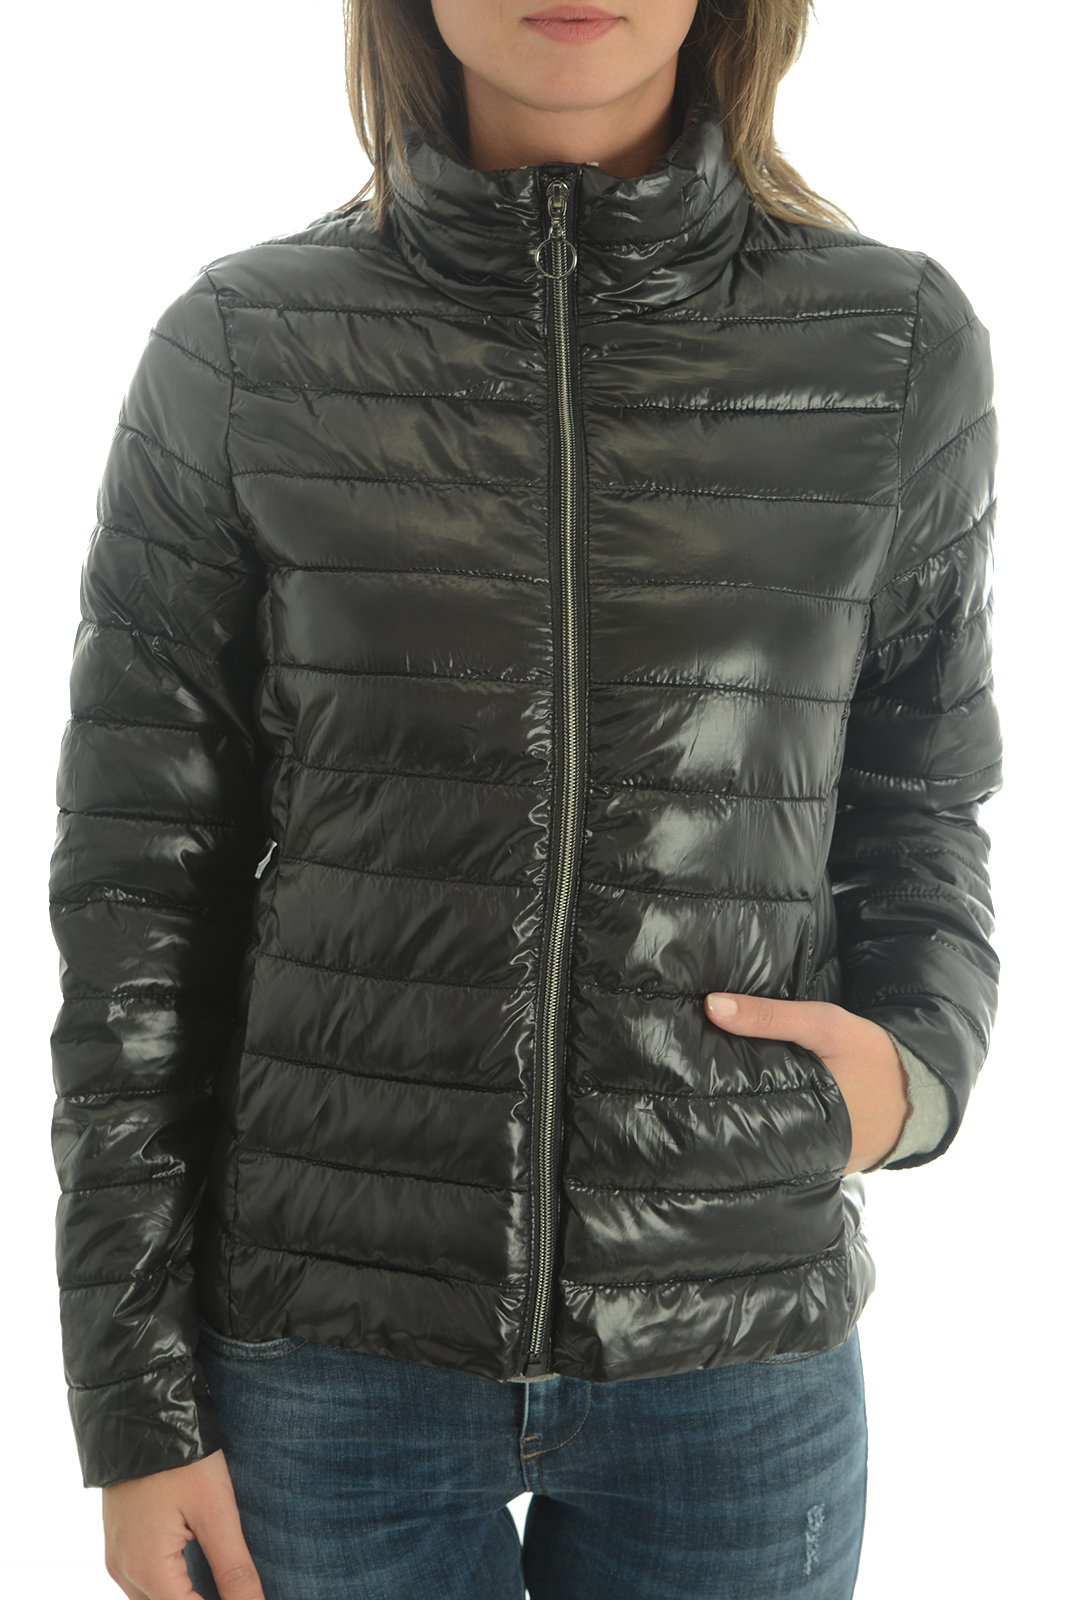 Vestes & blousons  Vero moda DOUBLE 3/4 JACKET MEDIUM GREY/BLACK